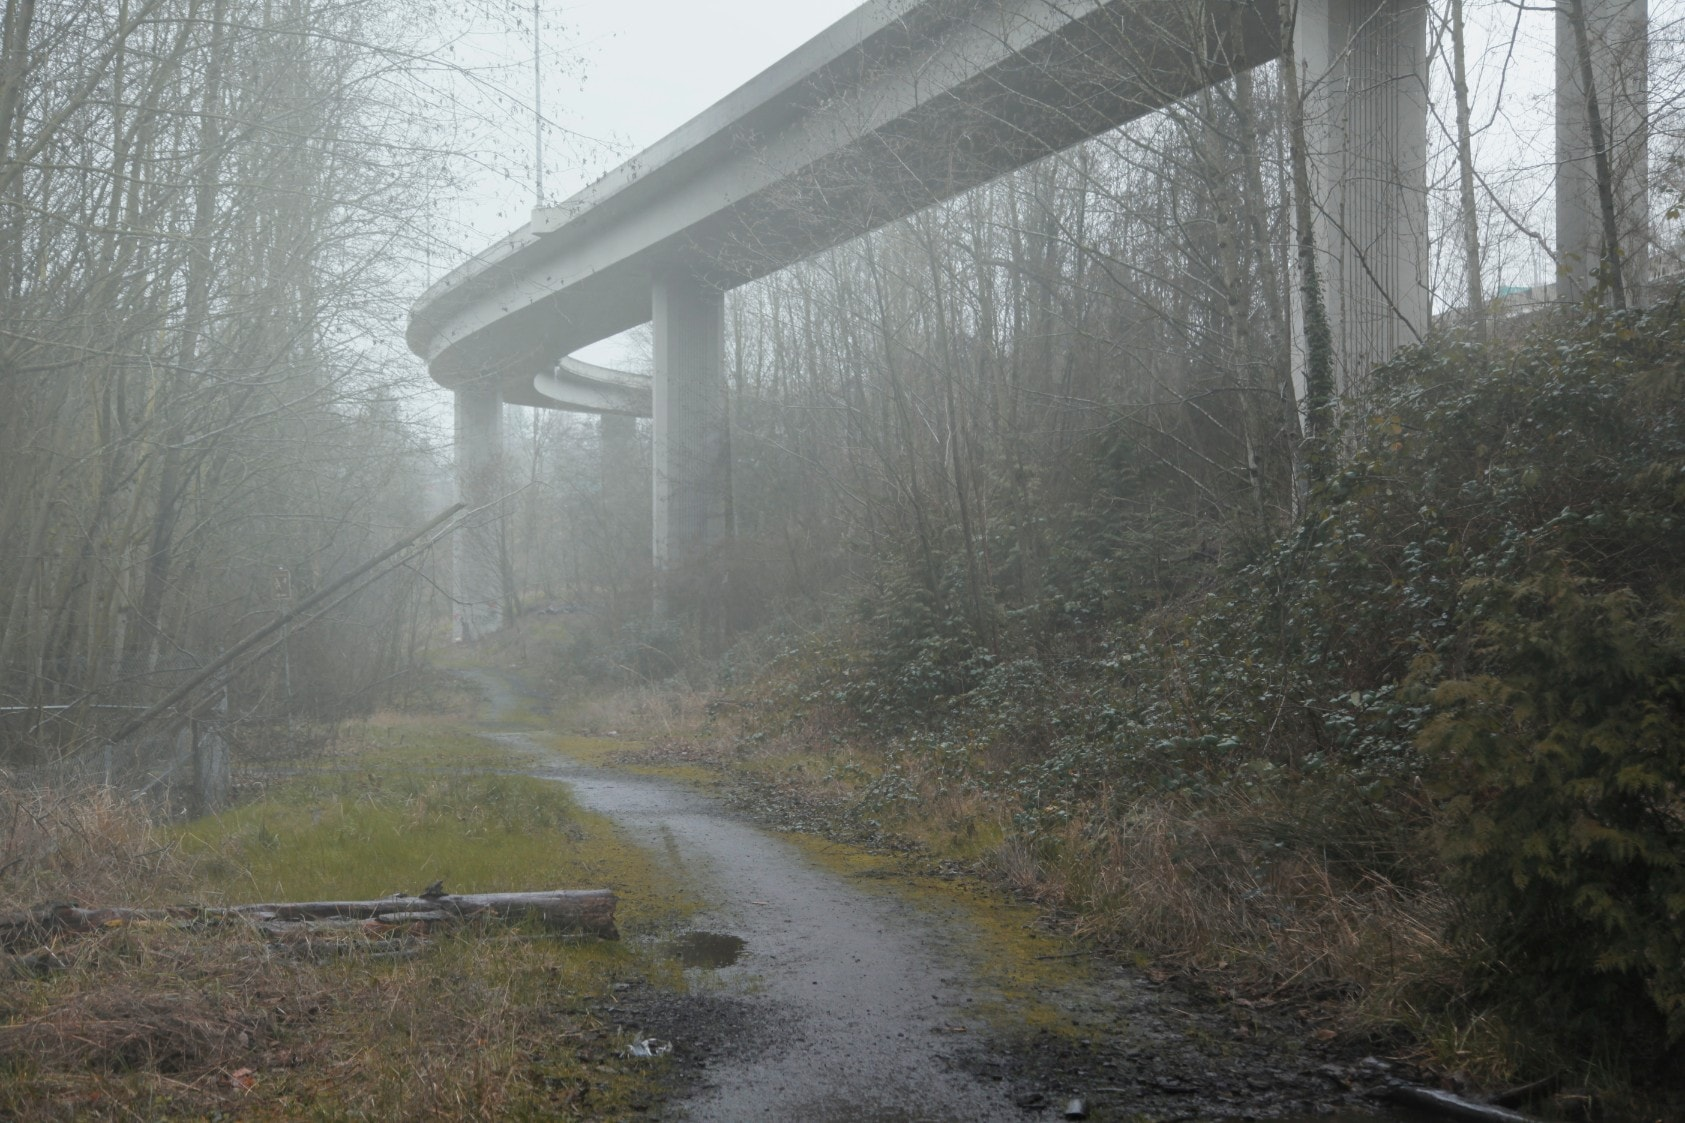 Desolation, Truth and Hazy Atmosphere – Fubiz Media Design